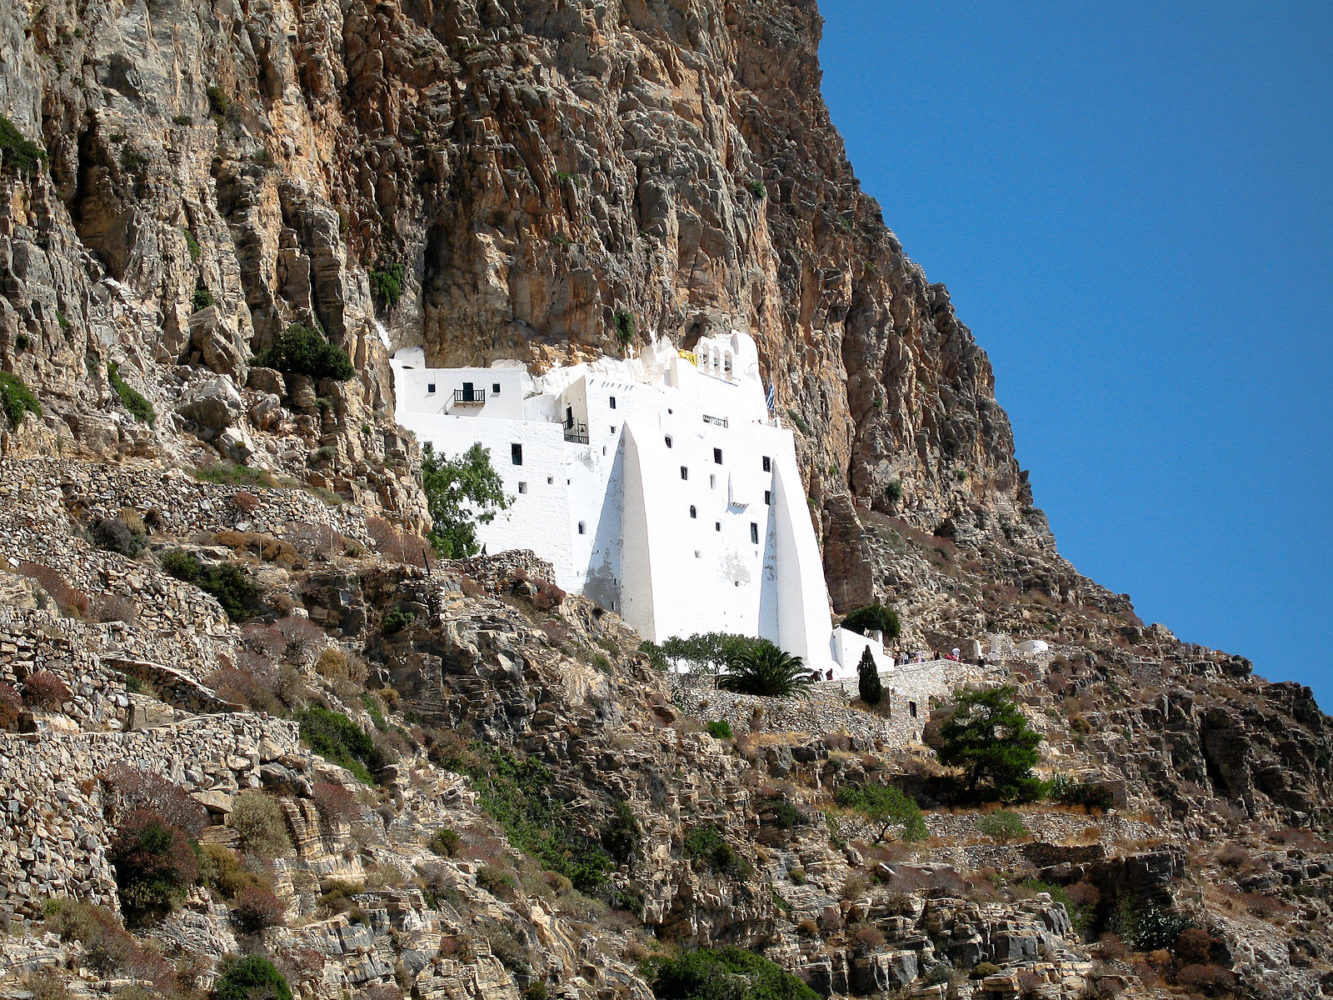 Amorgos Panagia eglise dans la roche